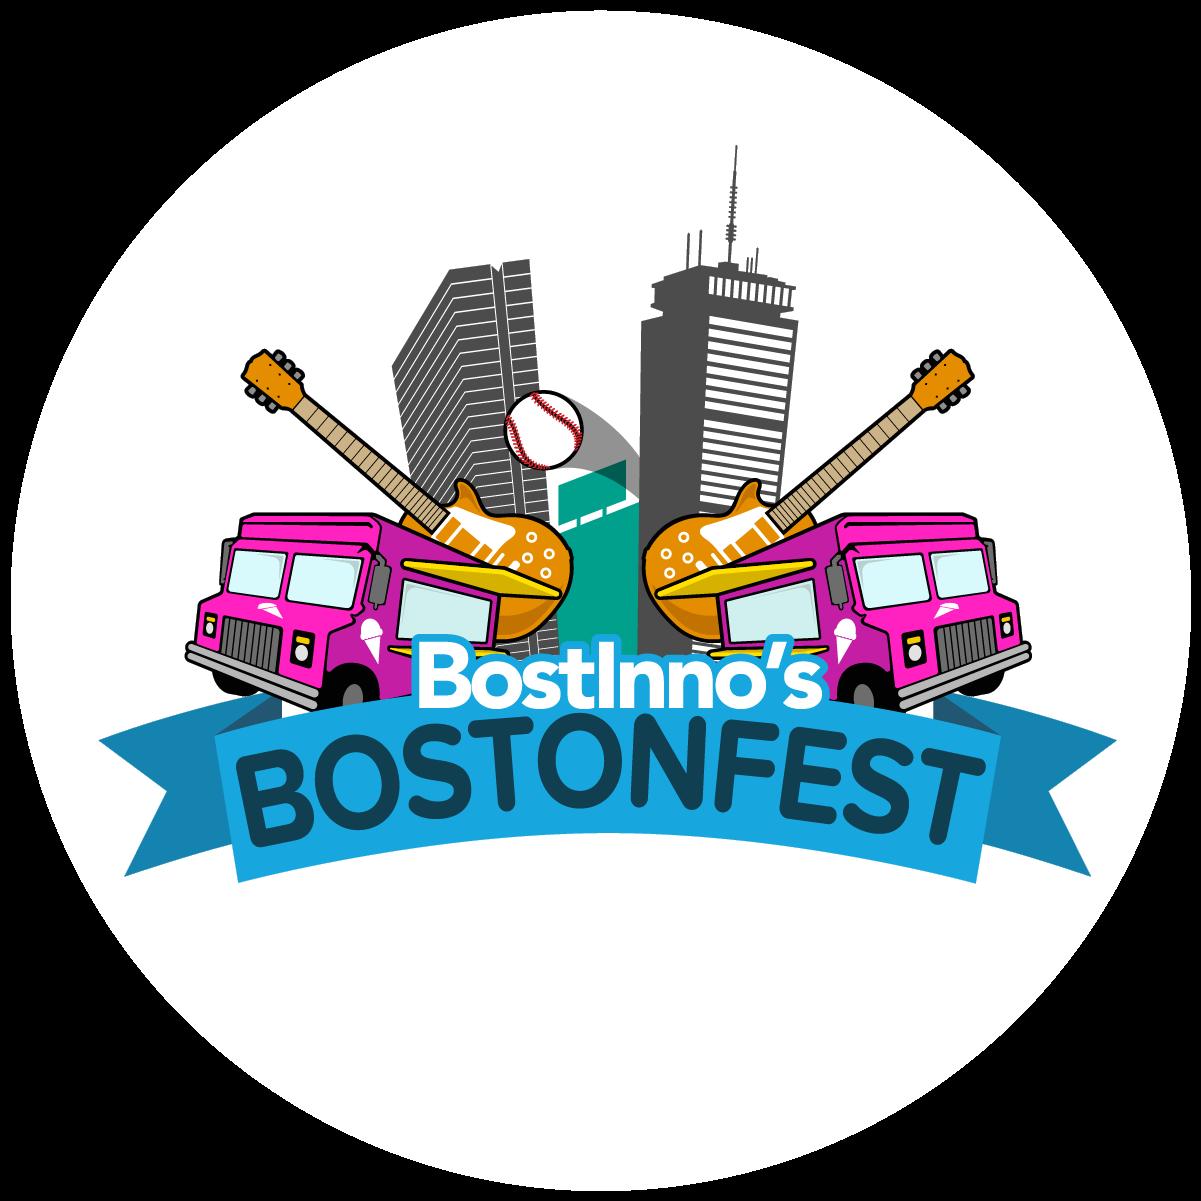 We're a finalist for @BostInno's #BostonFest #CoolestCompanies Competition! Vote here: https://t.co/IWkcWhQcHp https://t.co/AlIGST6IKk